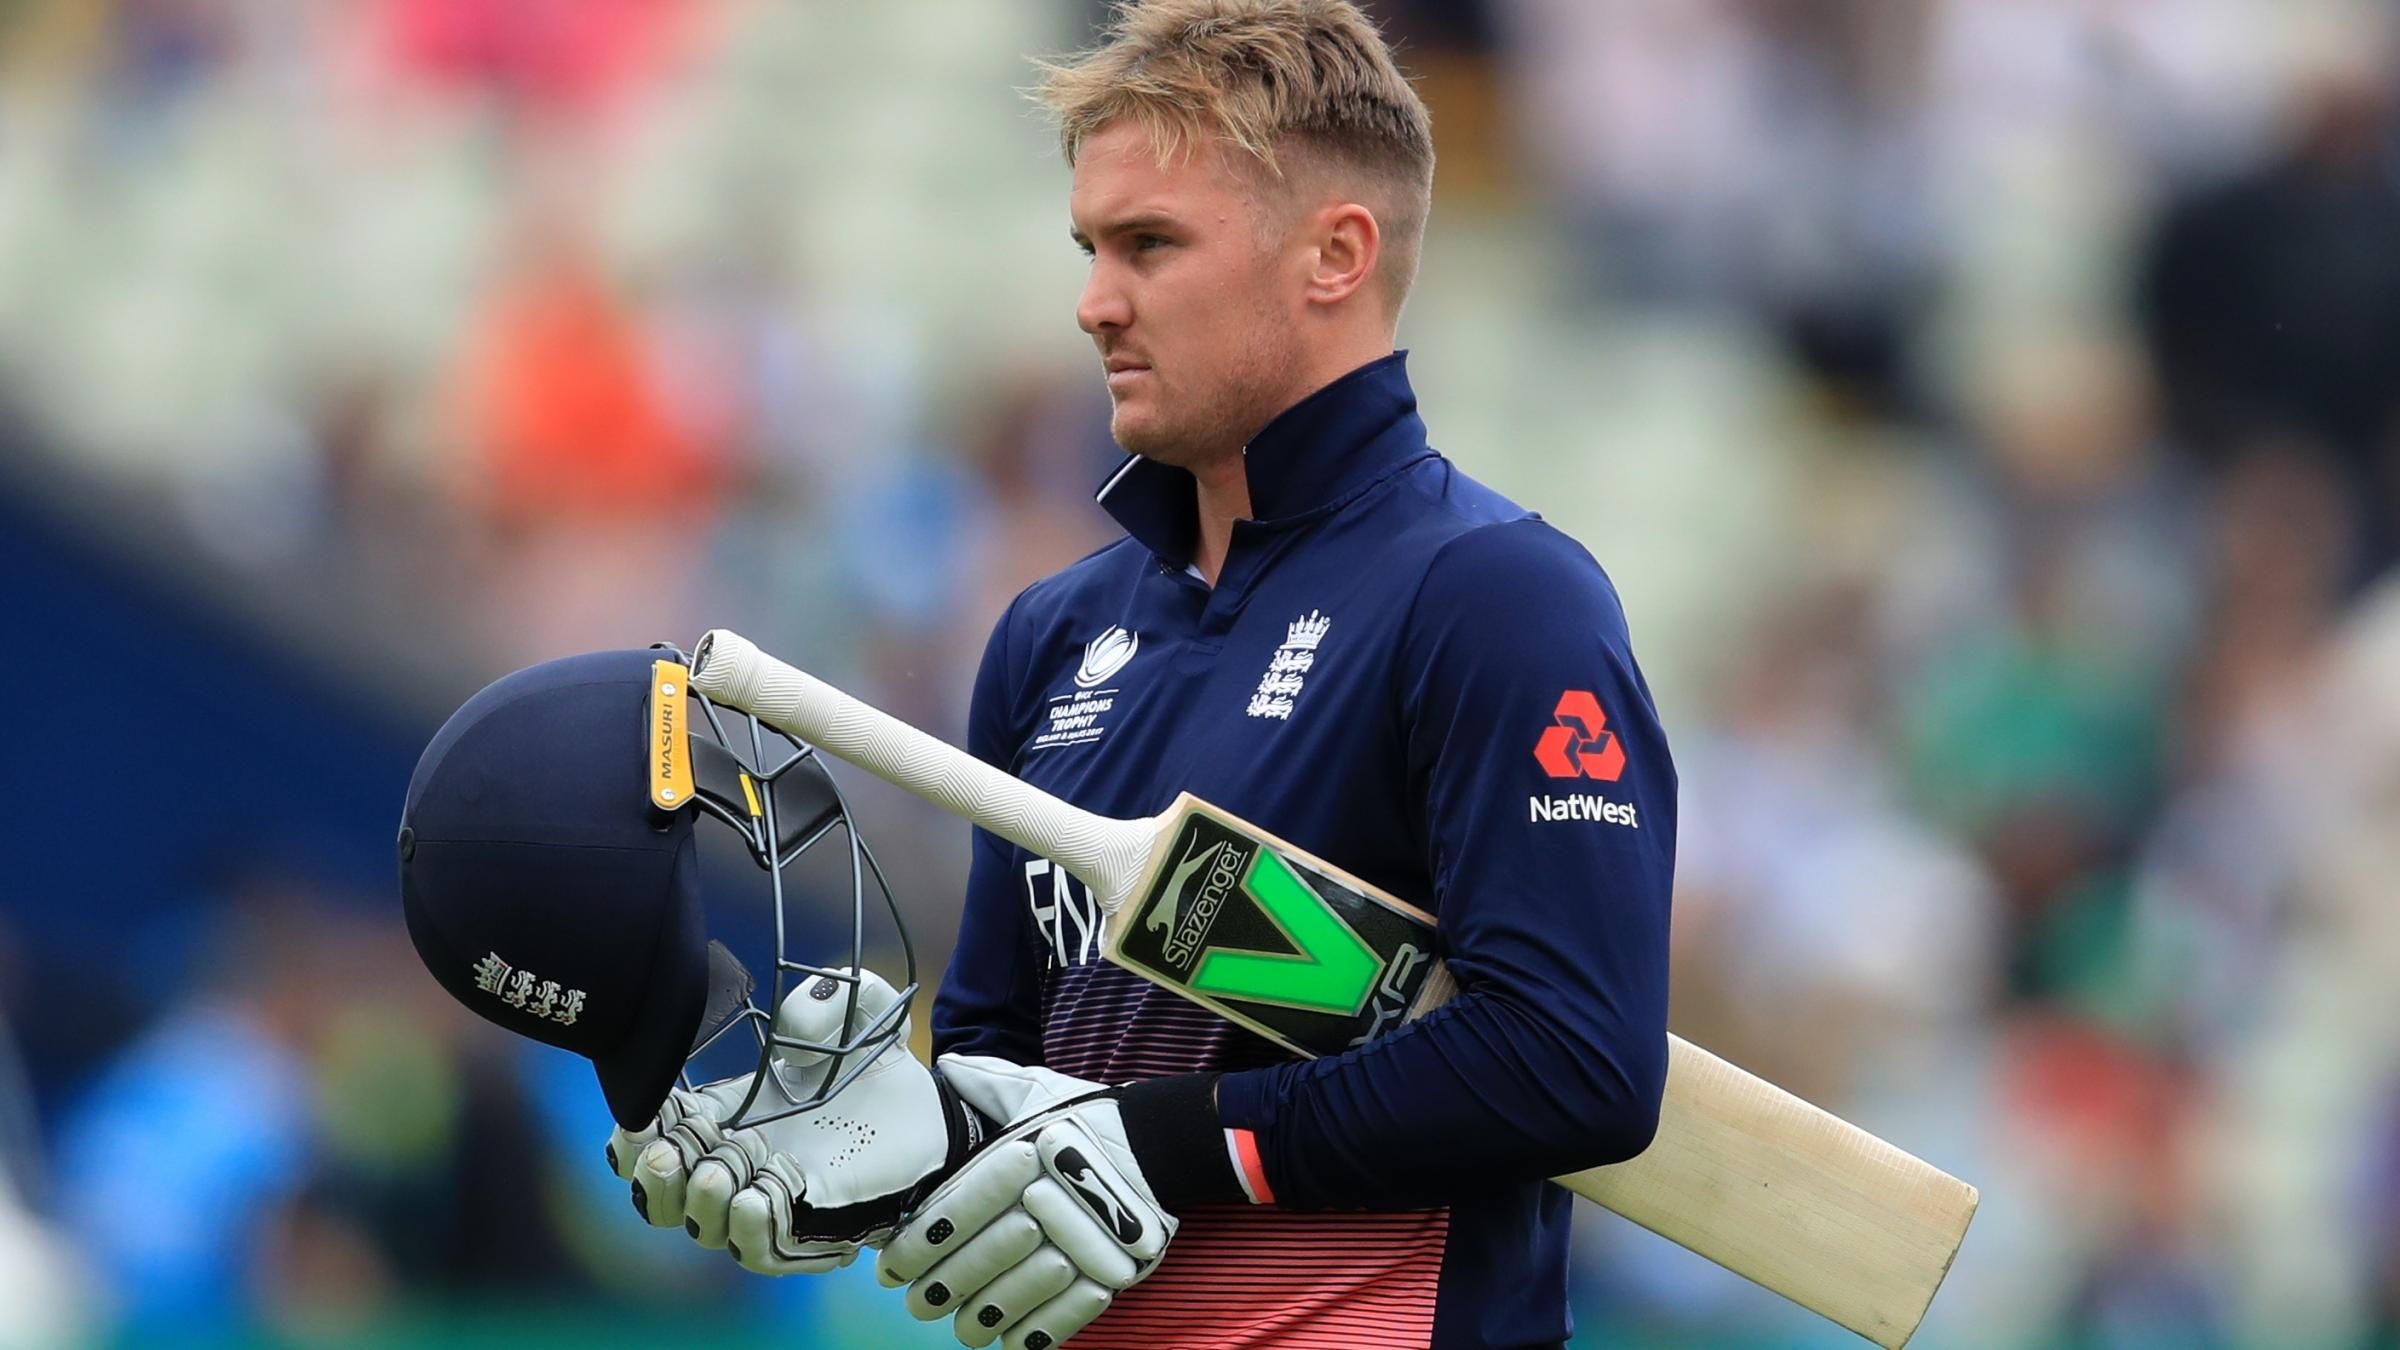 England vs Pakistan, ICC Champions Trophy 2017 semi-final, live cricket score